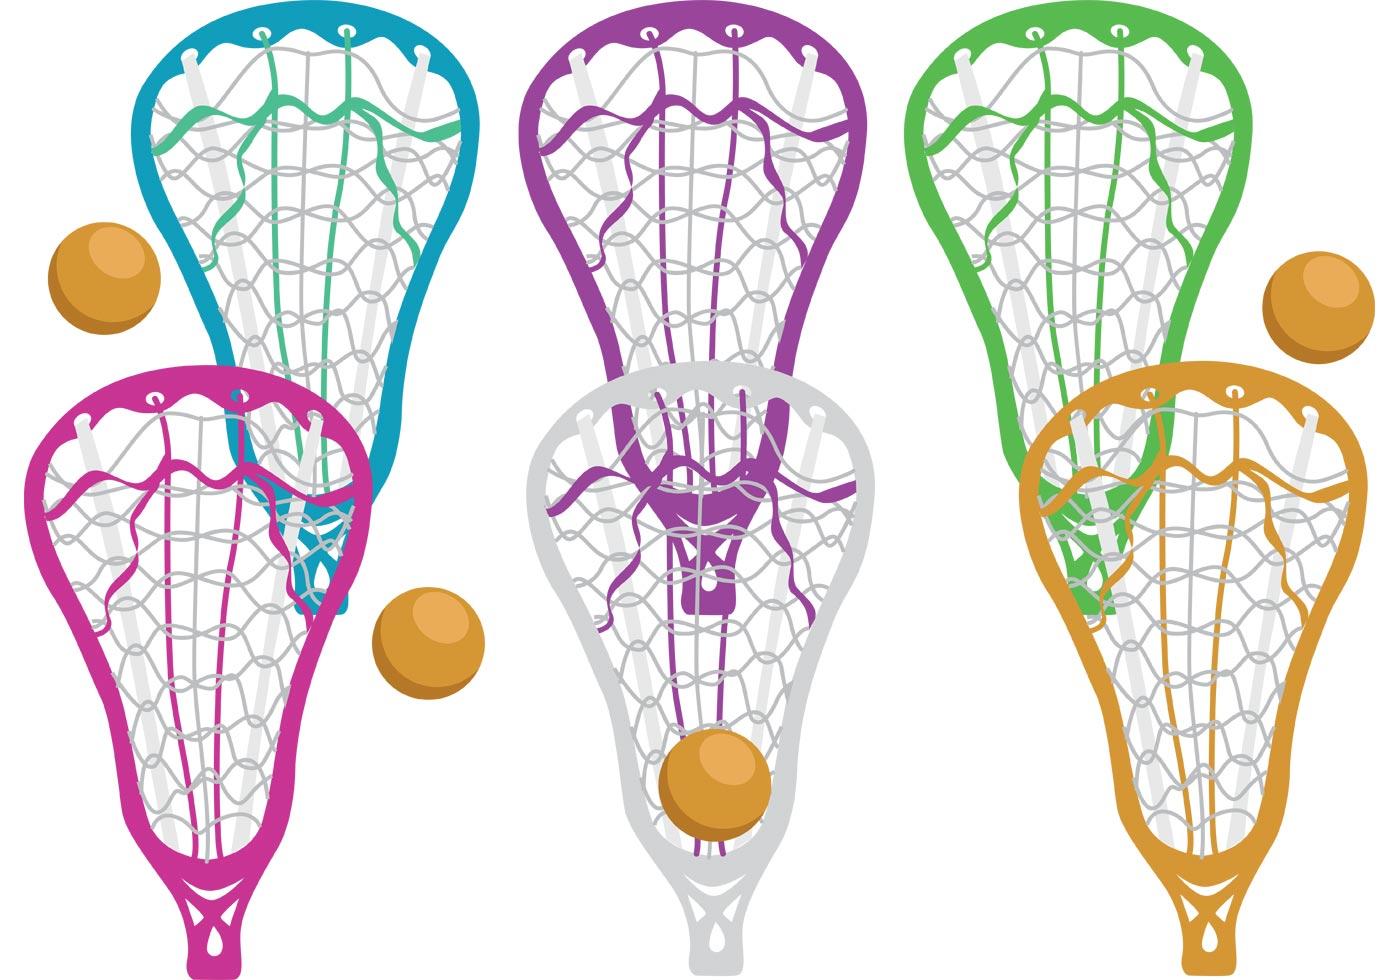 Cute Watercolor Olumpic Sports Equipment Background Vector: Colorful Lacrosse Stick Vectors